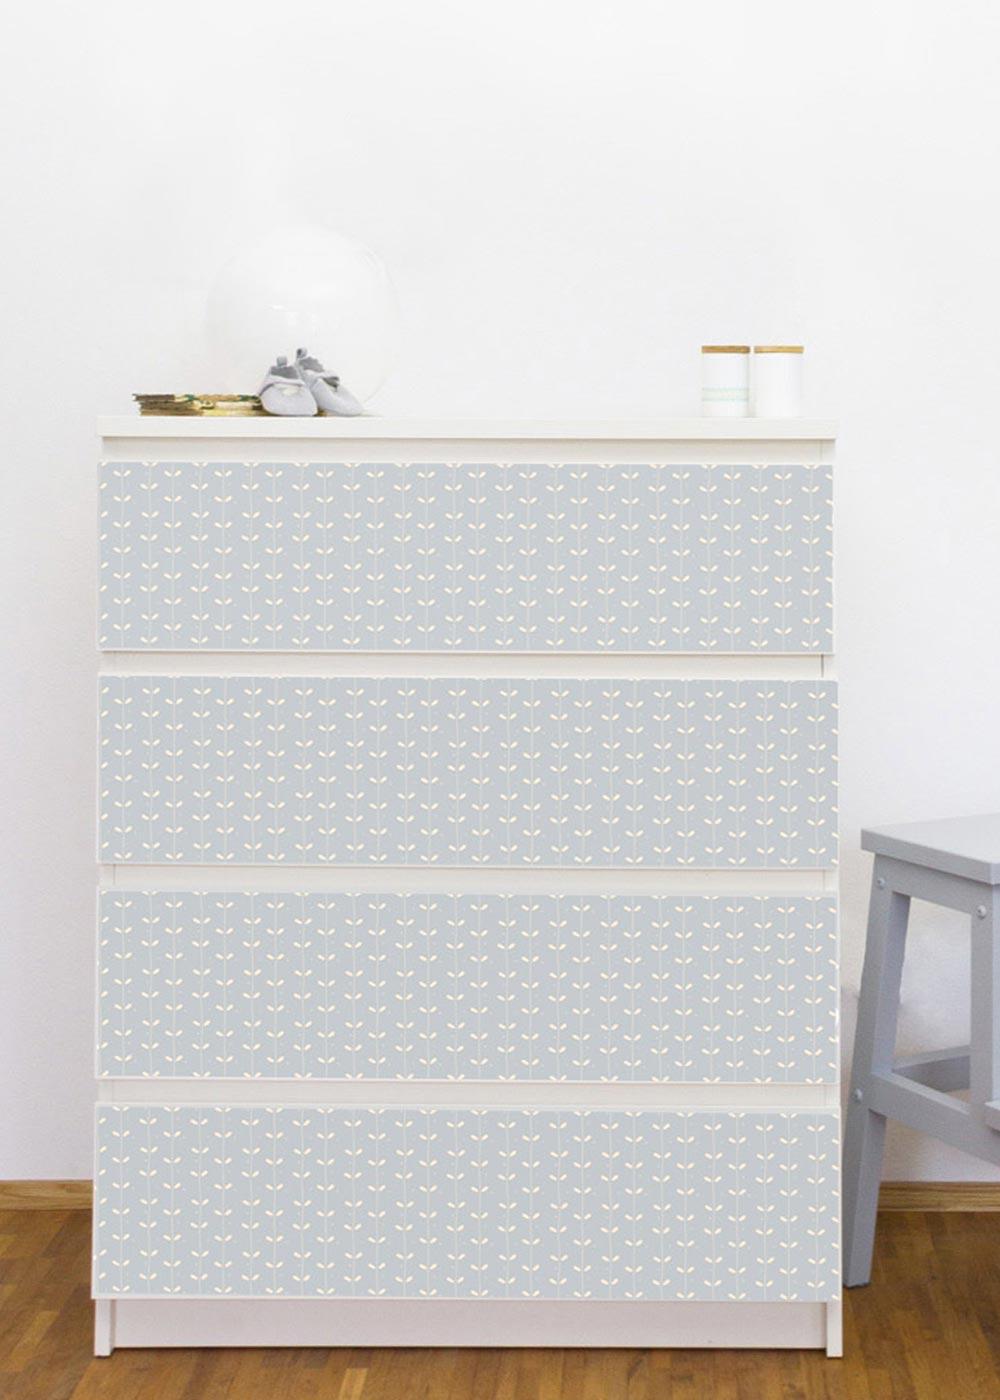 Ikea Malm Kommode Ährig Eisblau Gesamtansicht